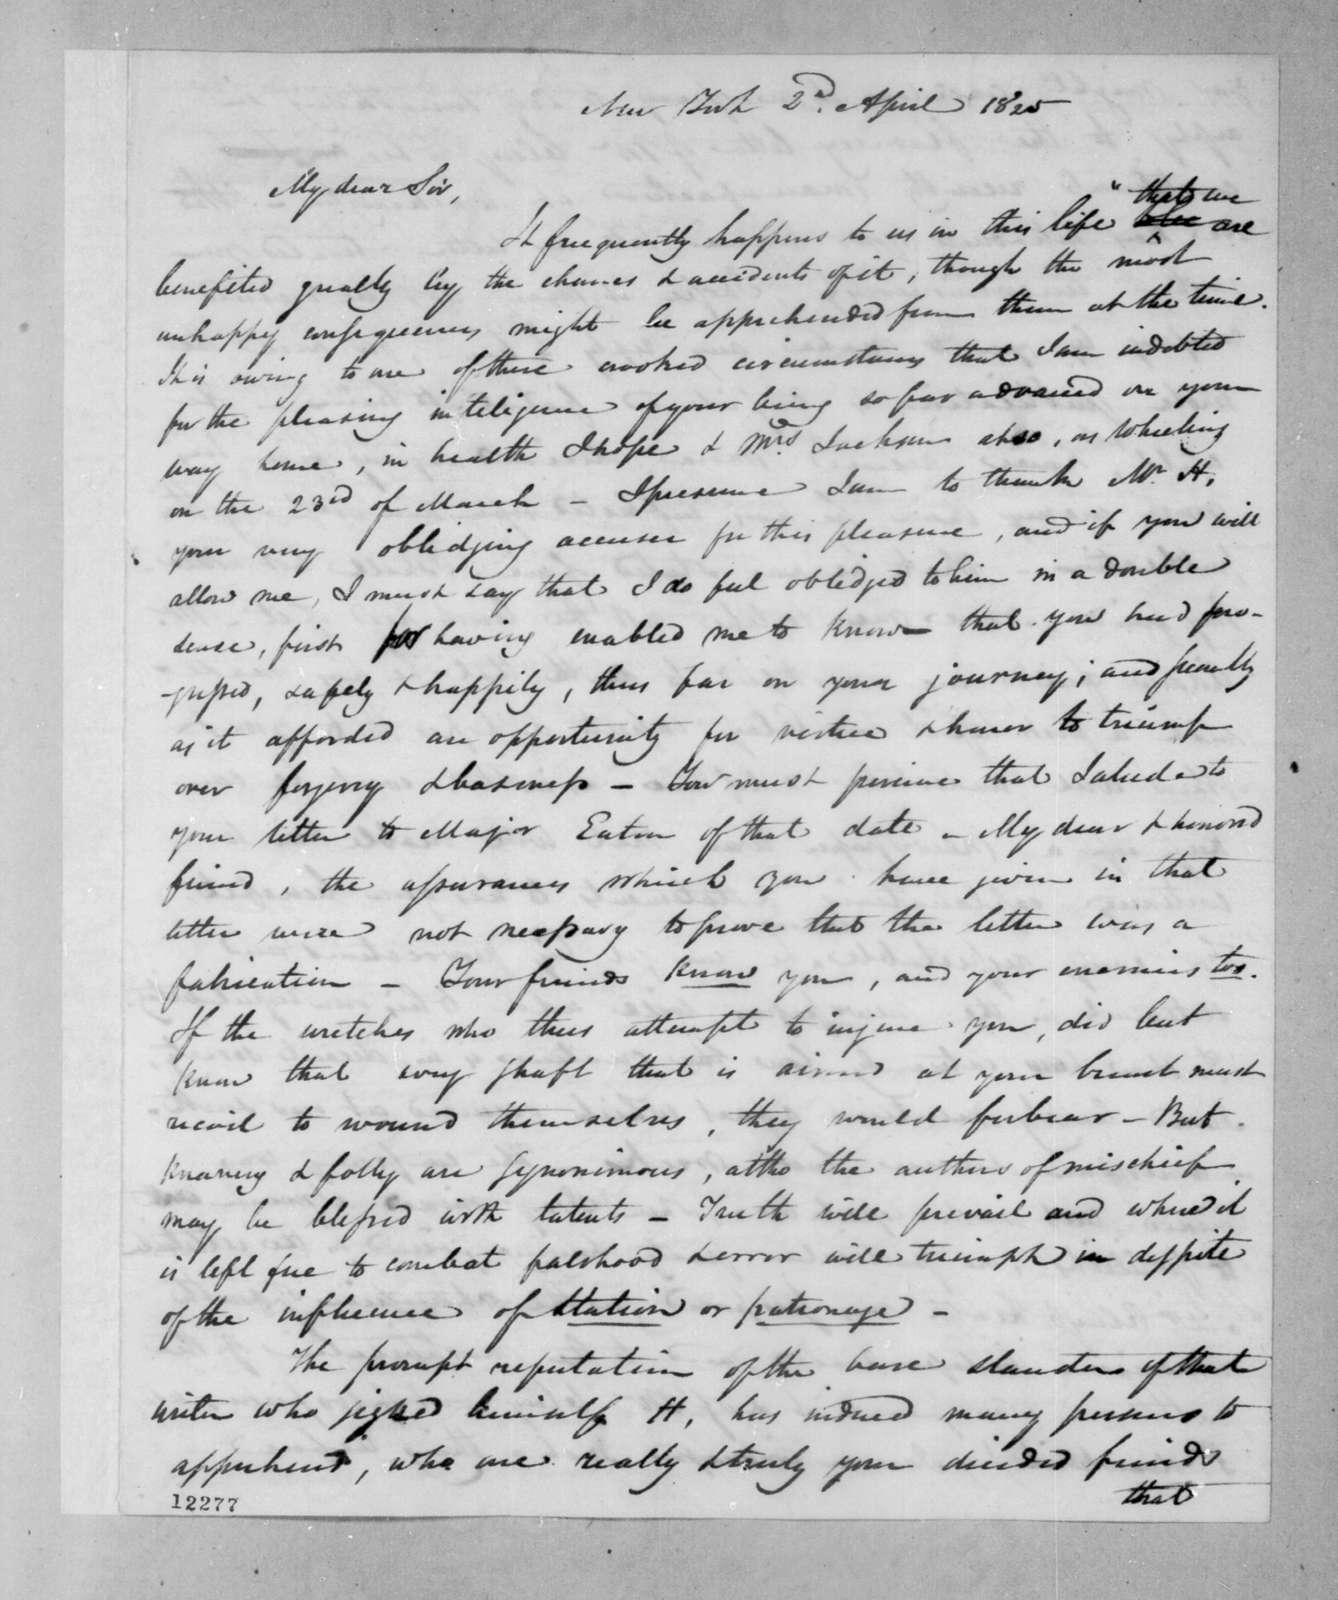 Samuel Swartwout to Andrew Jackson, April 2, 1825